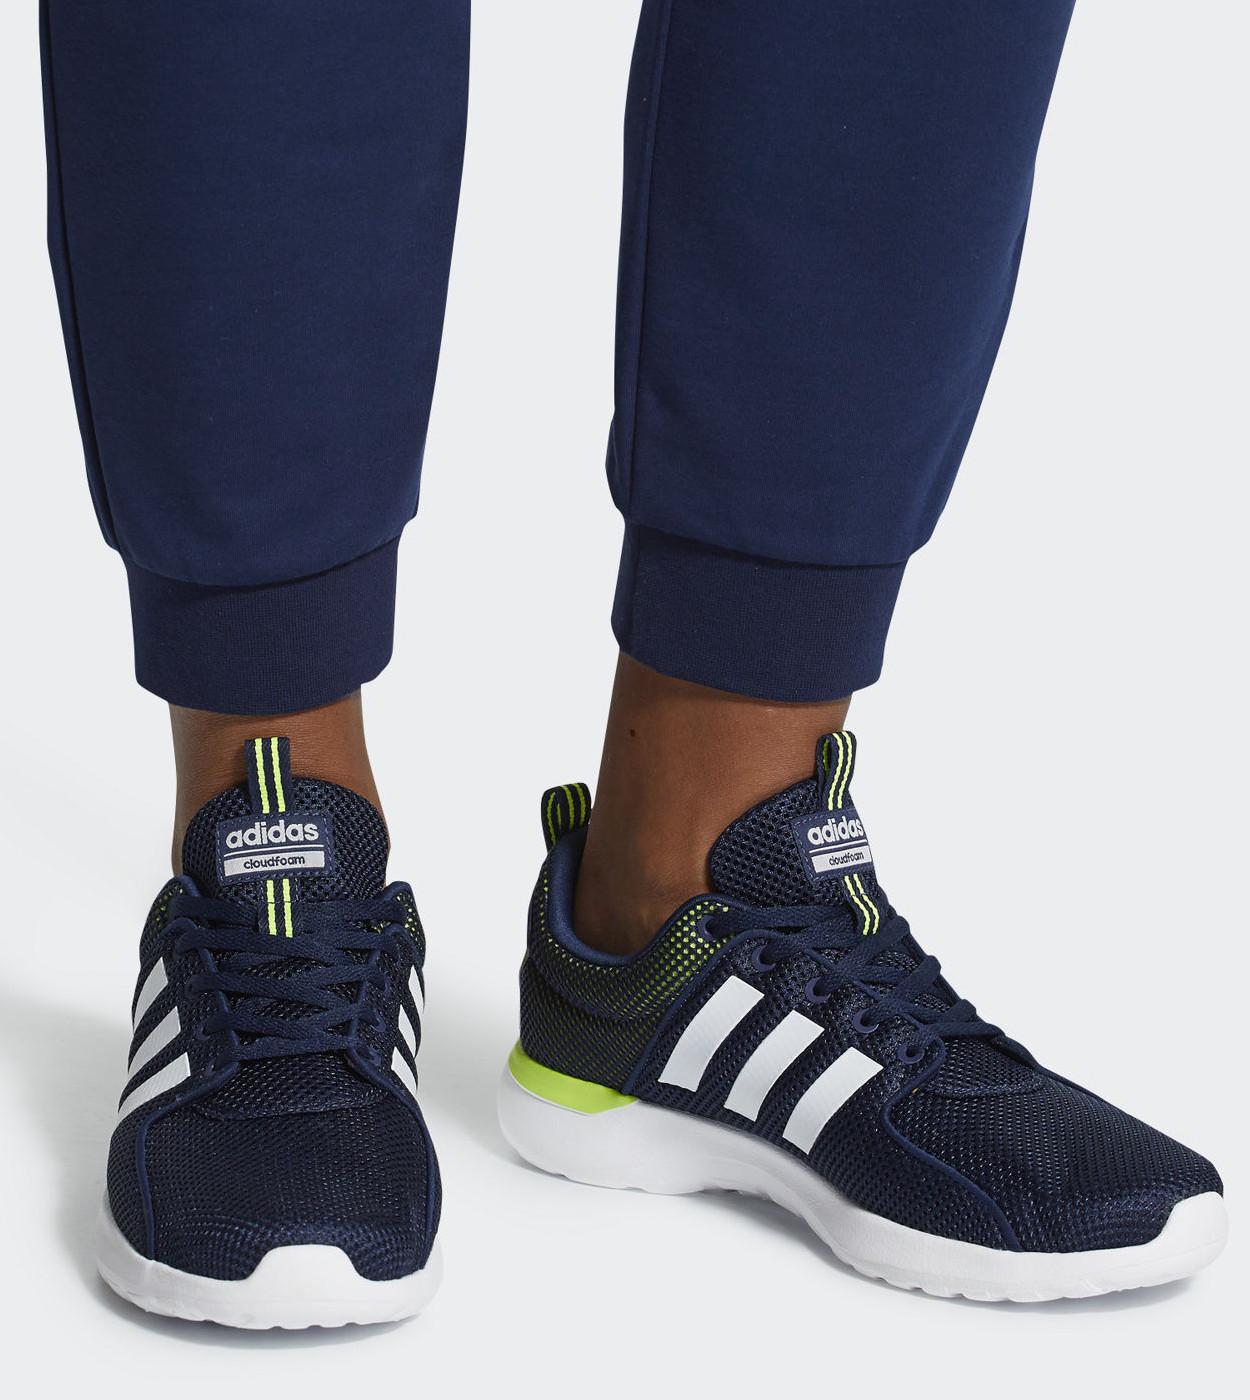 adidas neo kinderschuhe blau